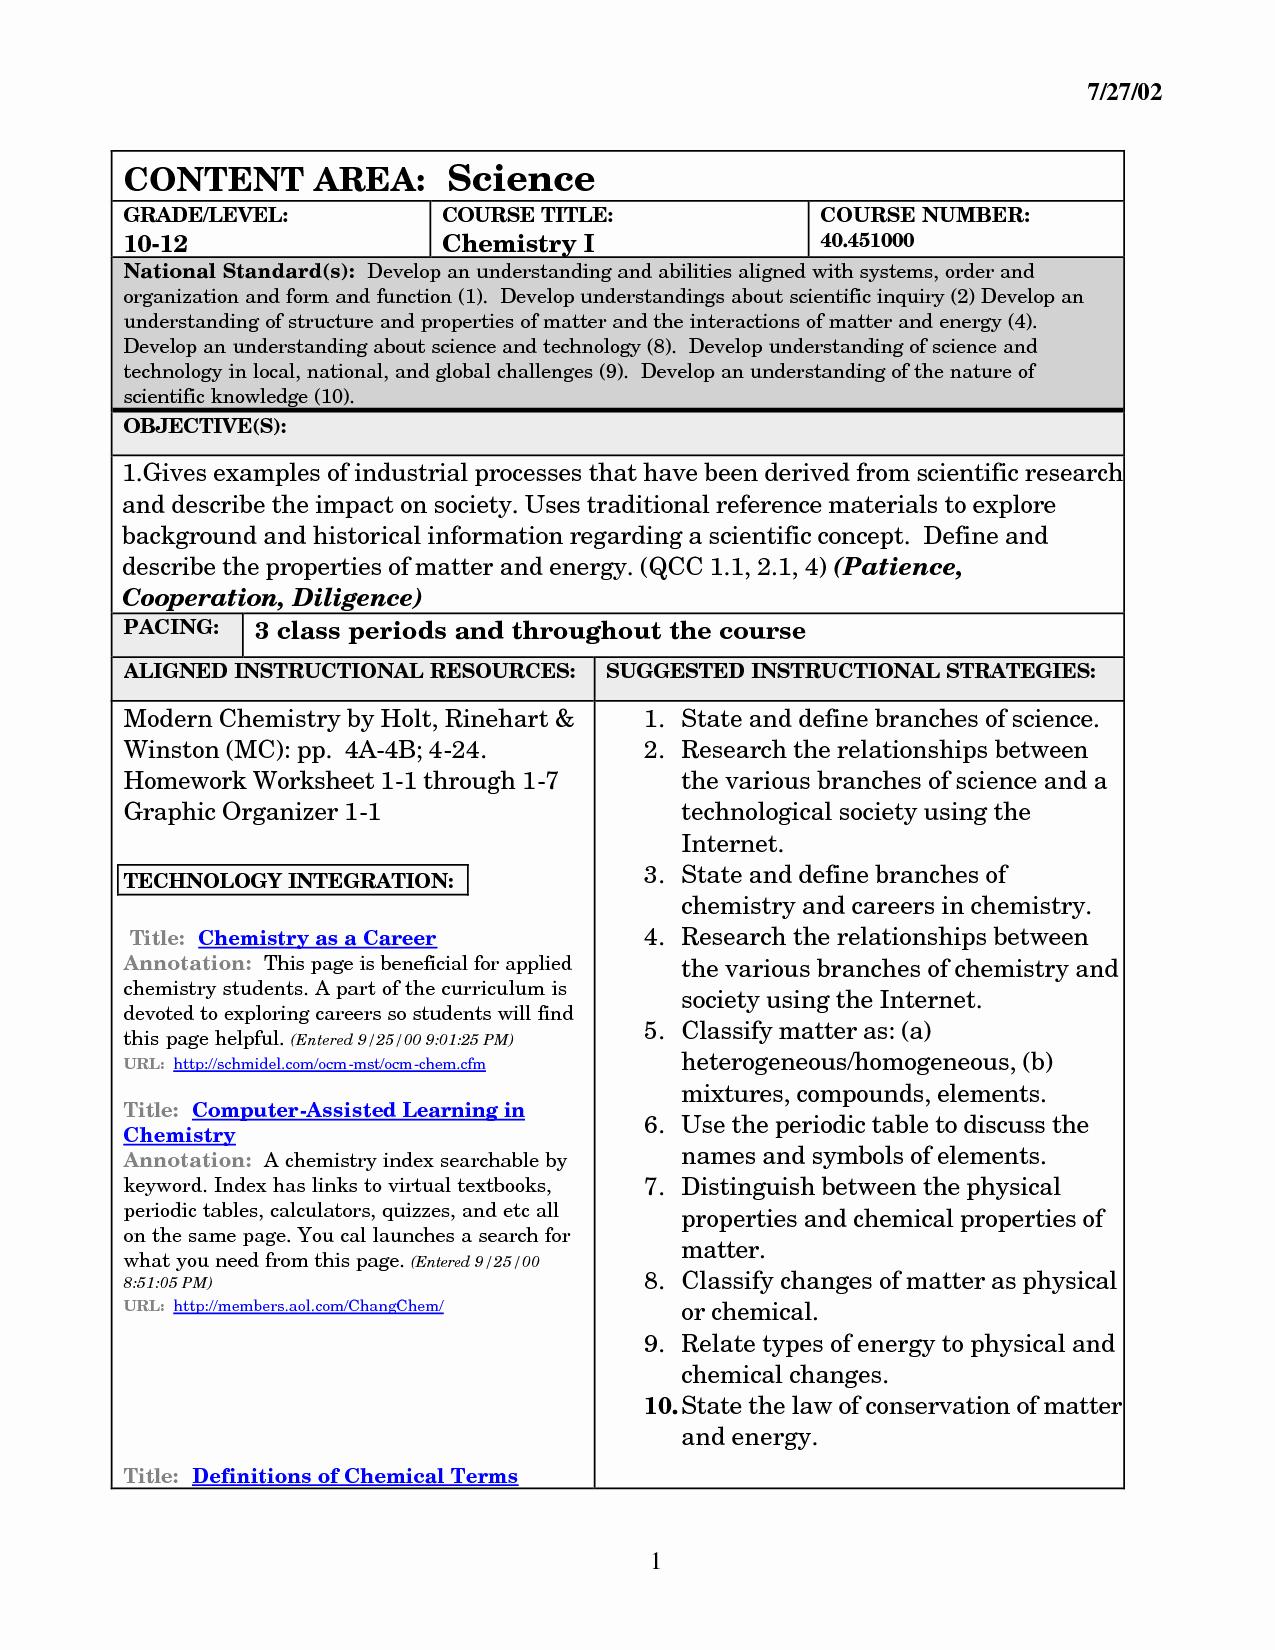 Nuclear Decay Worksheet Answers Key Elegant 15 Best Of Nuclear Chemistry Worksheet Answer Key